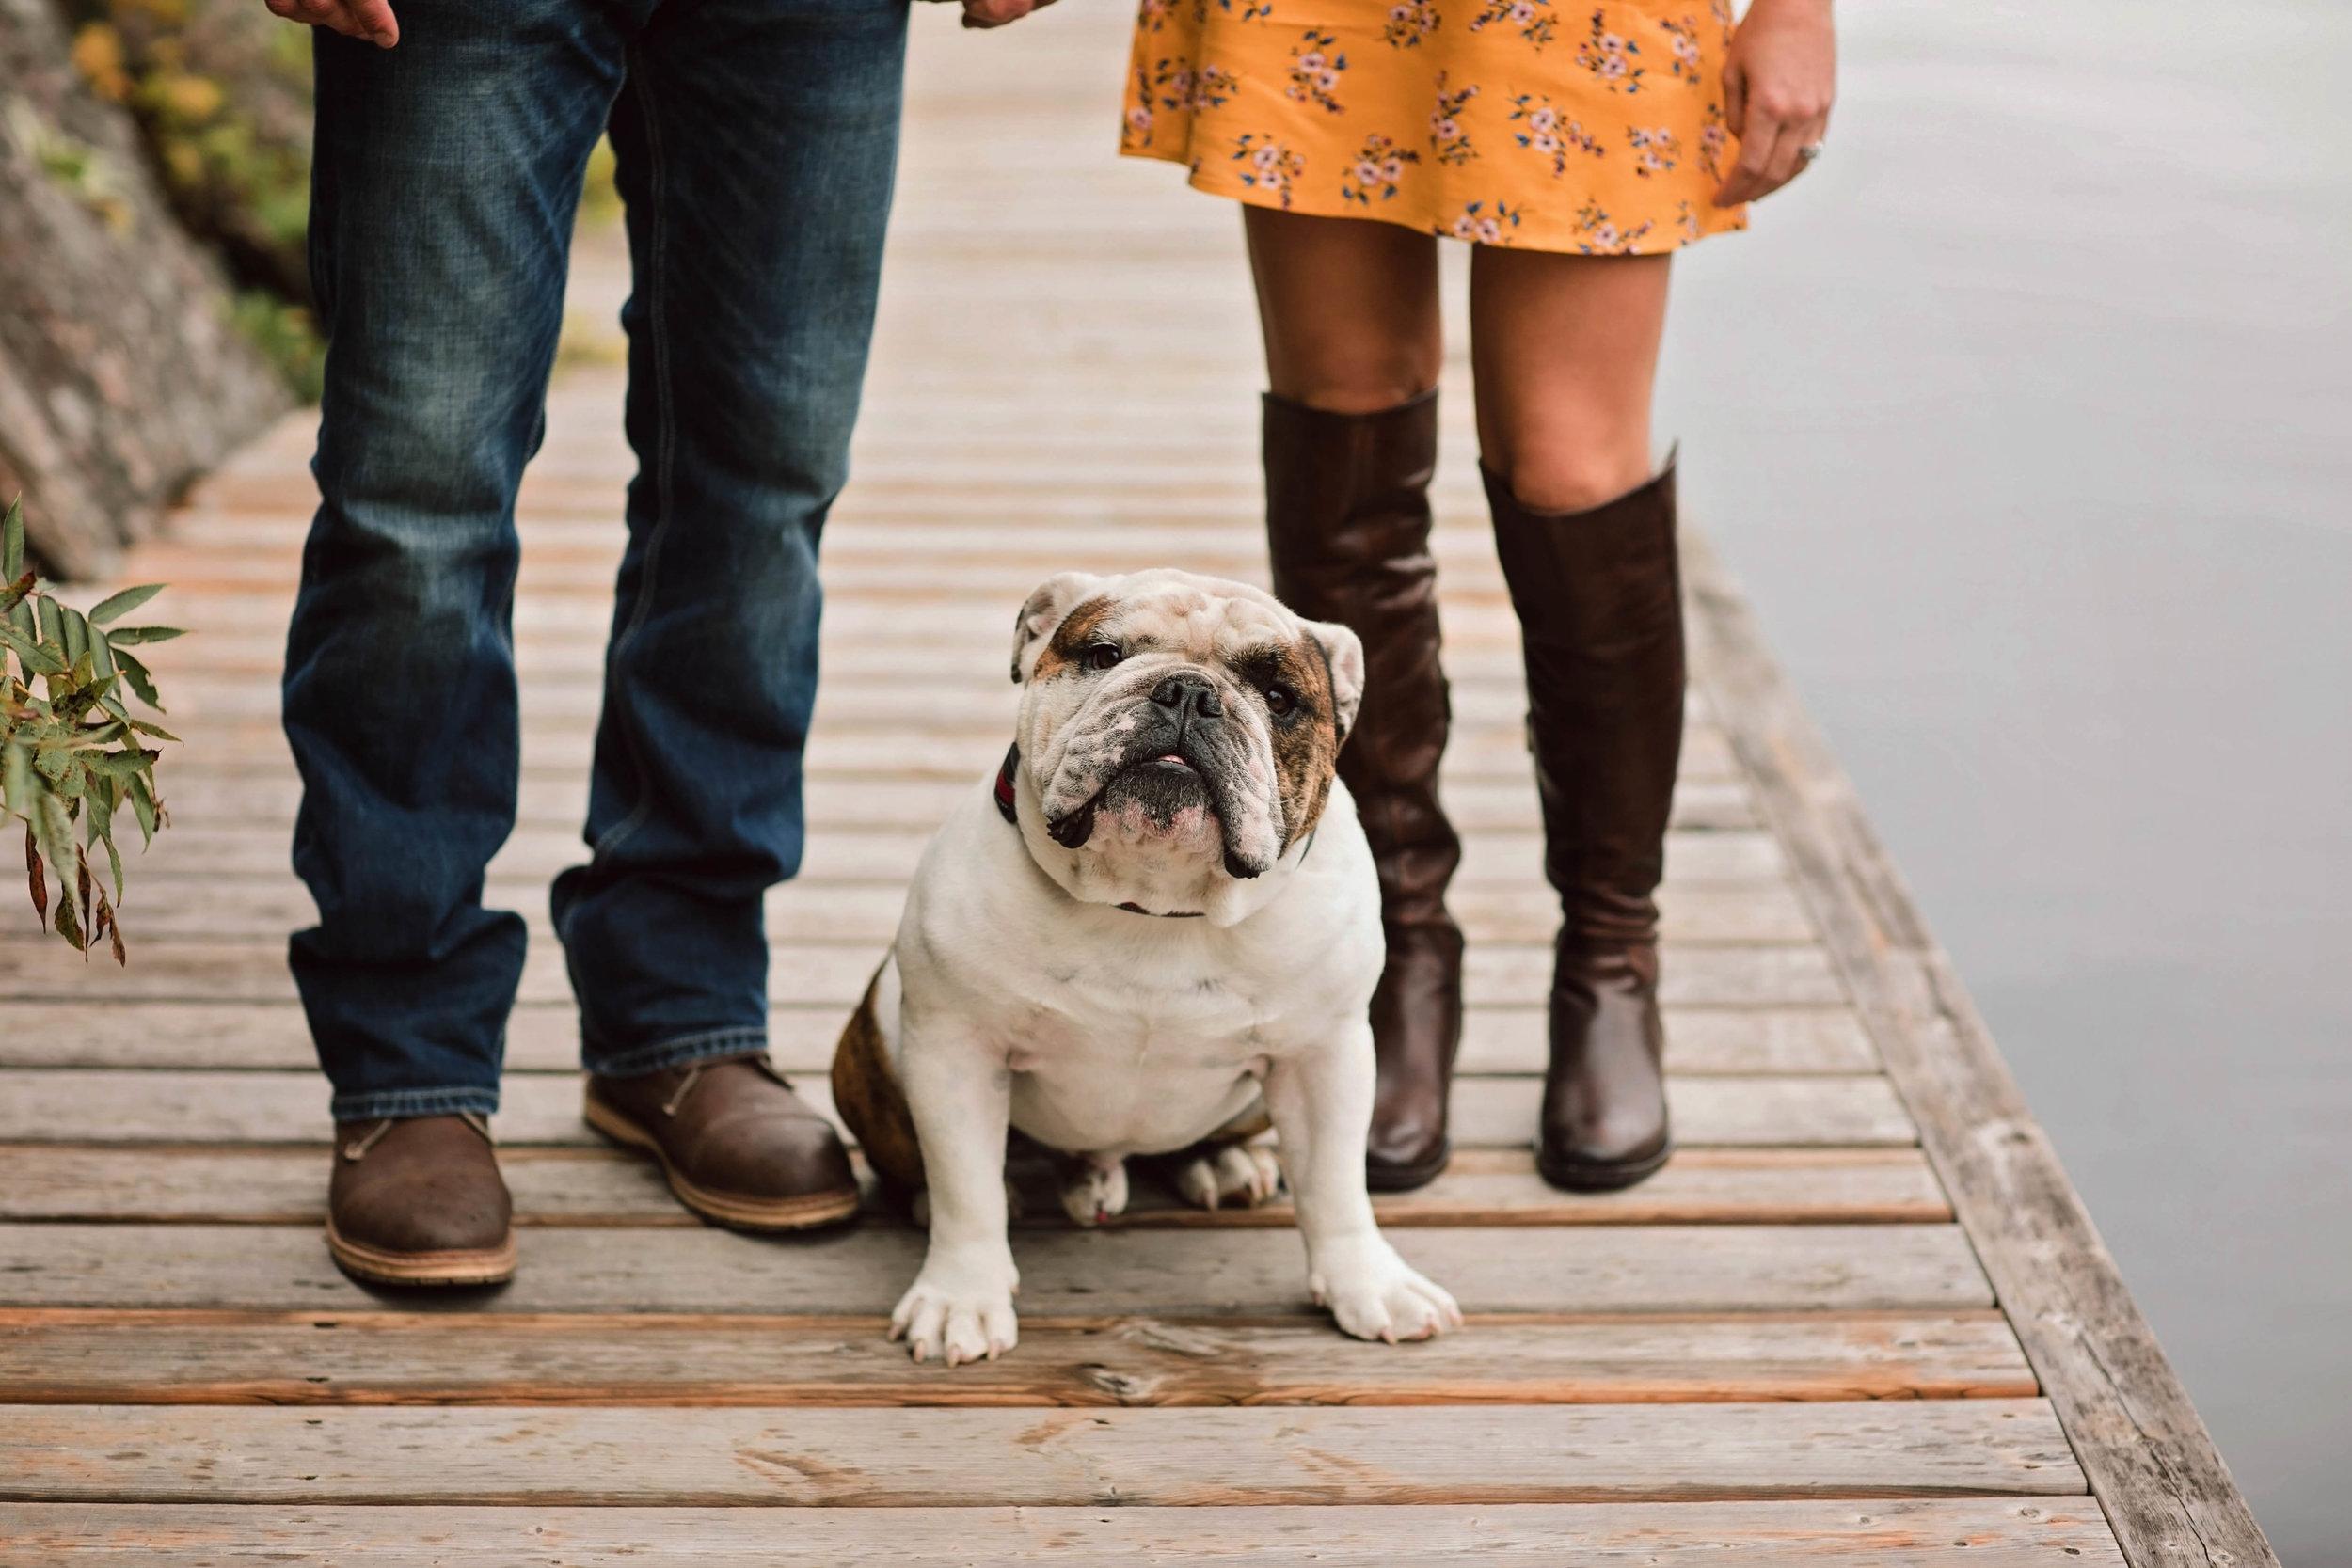 Morgan Bress Photography | Lindsay Wedding Photographer | Engagement Session with Dog | Kawartha Lakes Wedding Photographer | Ontario Wedding Photographer |  Burleigh Falls, Ontario | Waterfall Engagement